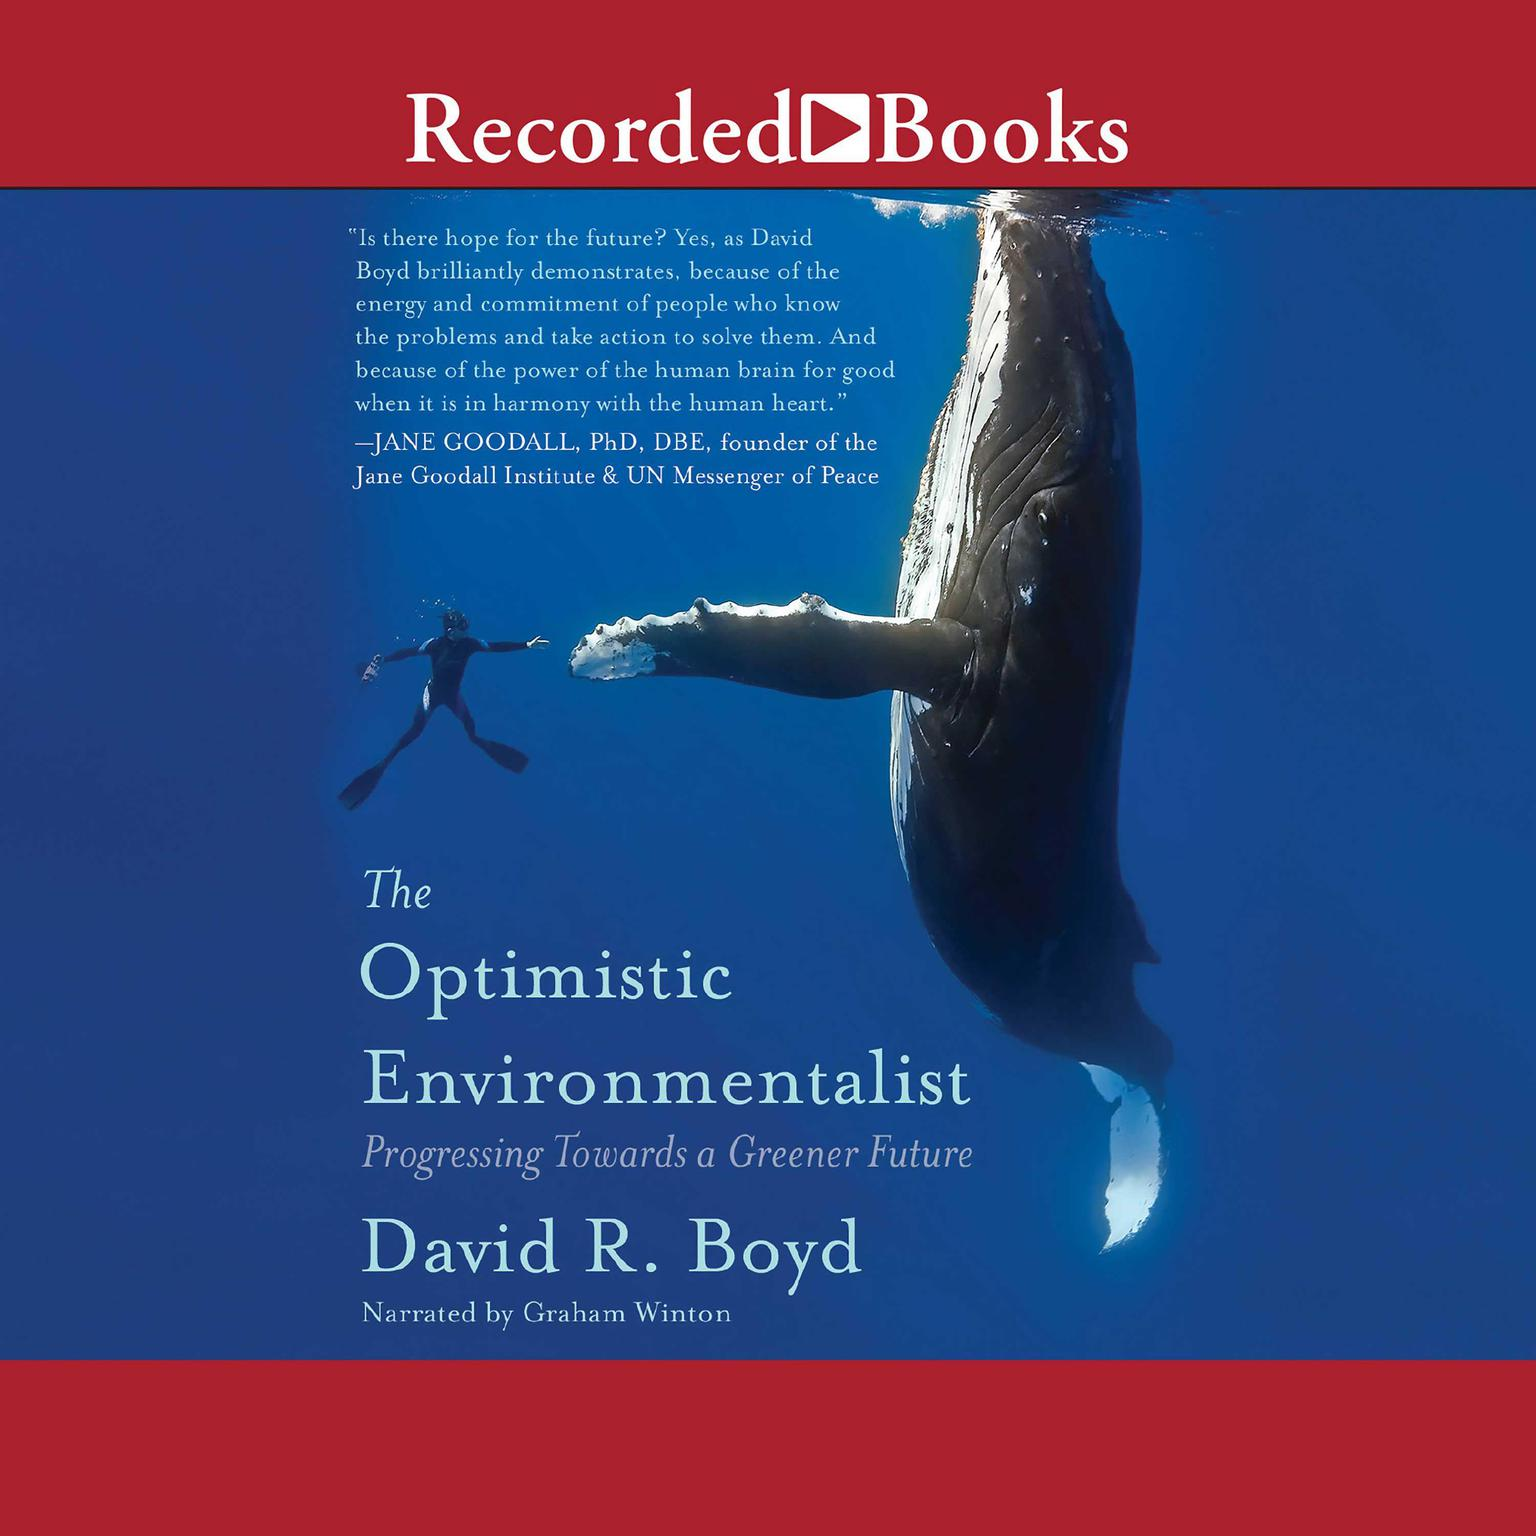 The Optimistic Environmentalist: Progressing Toward a Greener Future Audiobook, by David R. Boyd